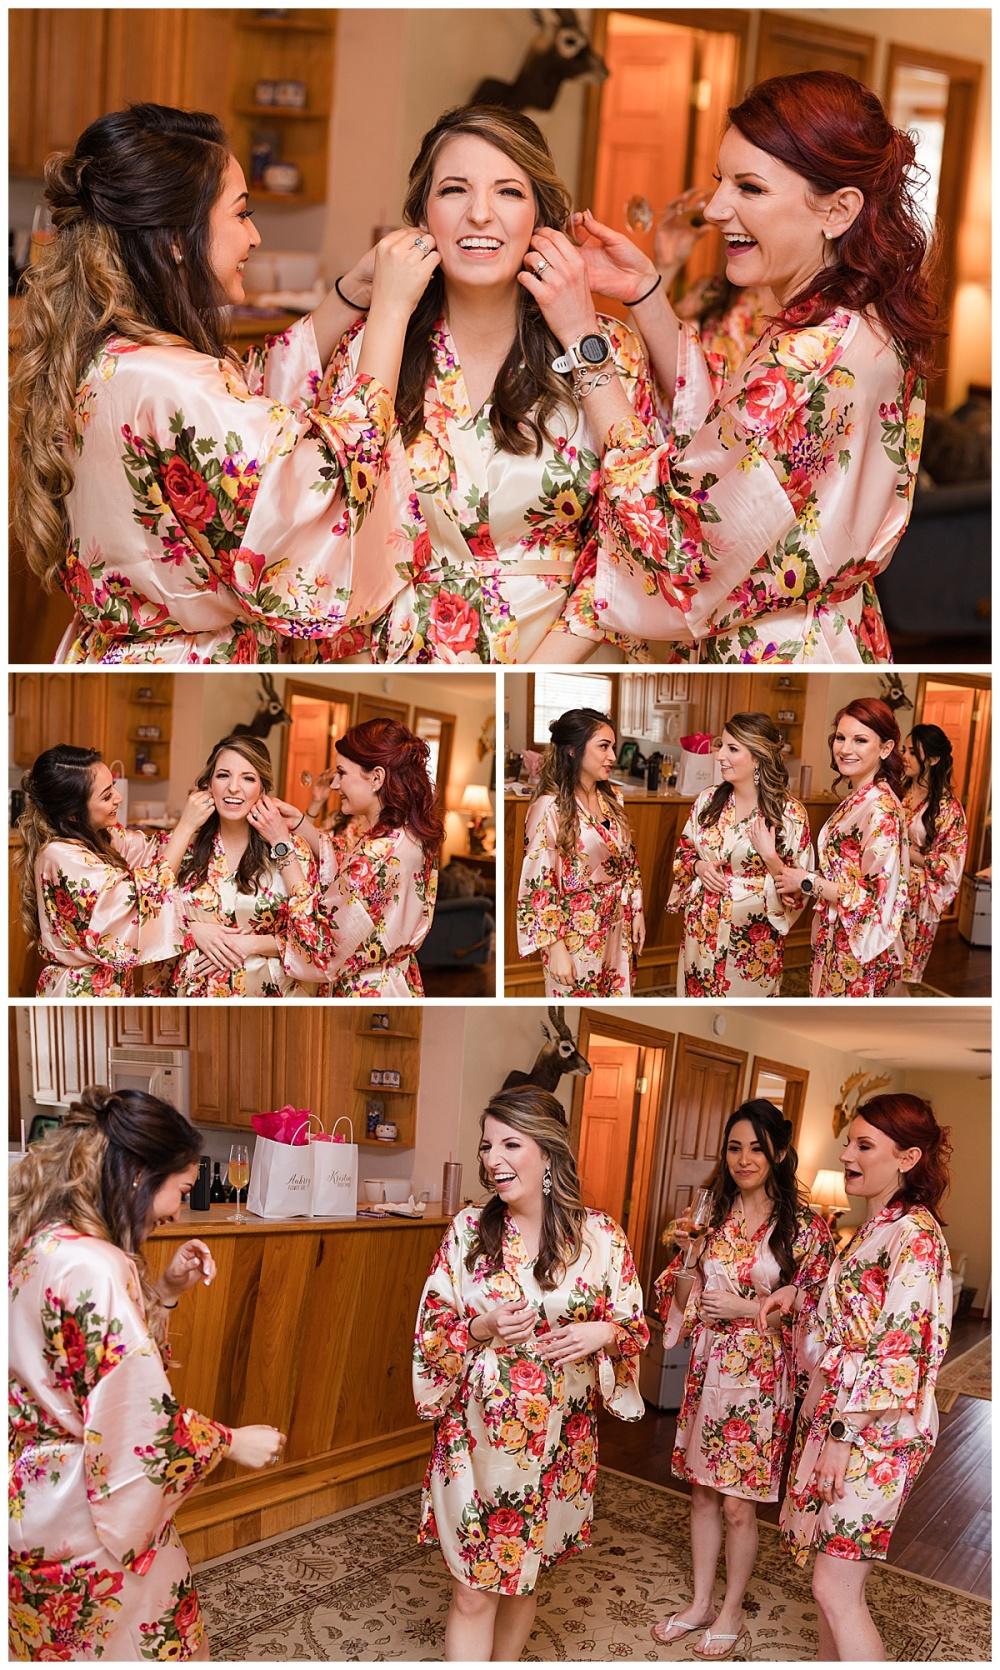 Wedding-Photographer-Texas-Hill-Country-Happy-H-Ranch-Comfor-Texas-Carly-Barton-Photography_0010.jpg